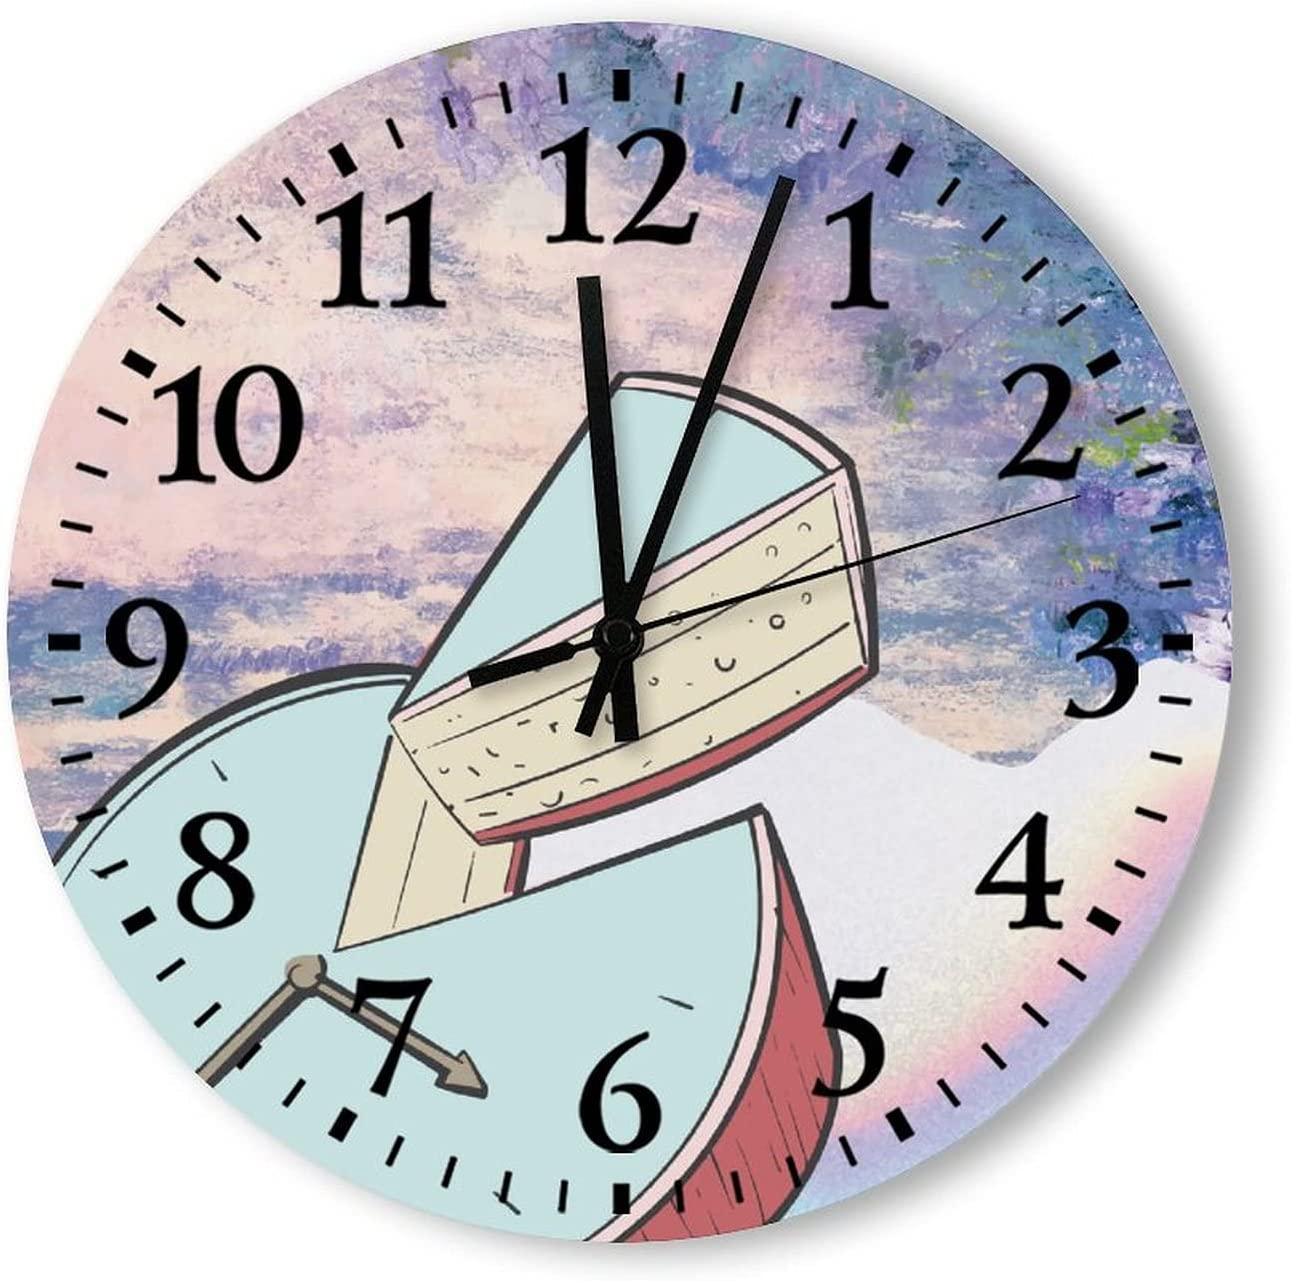 Wall Clock Silent NEW Non Ticking Battery Operate Modern Clocks